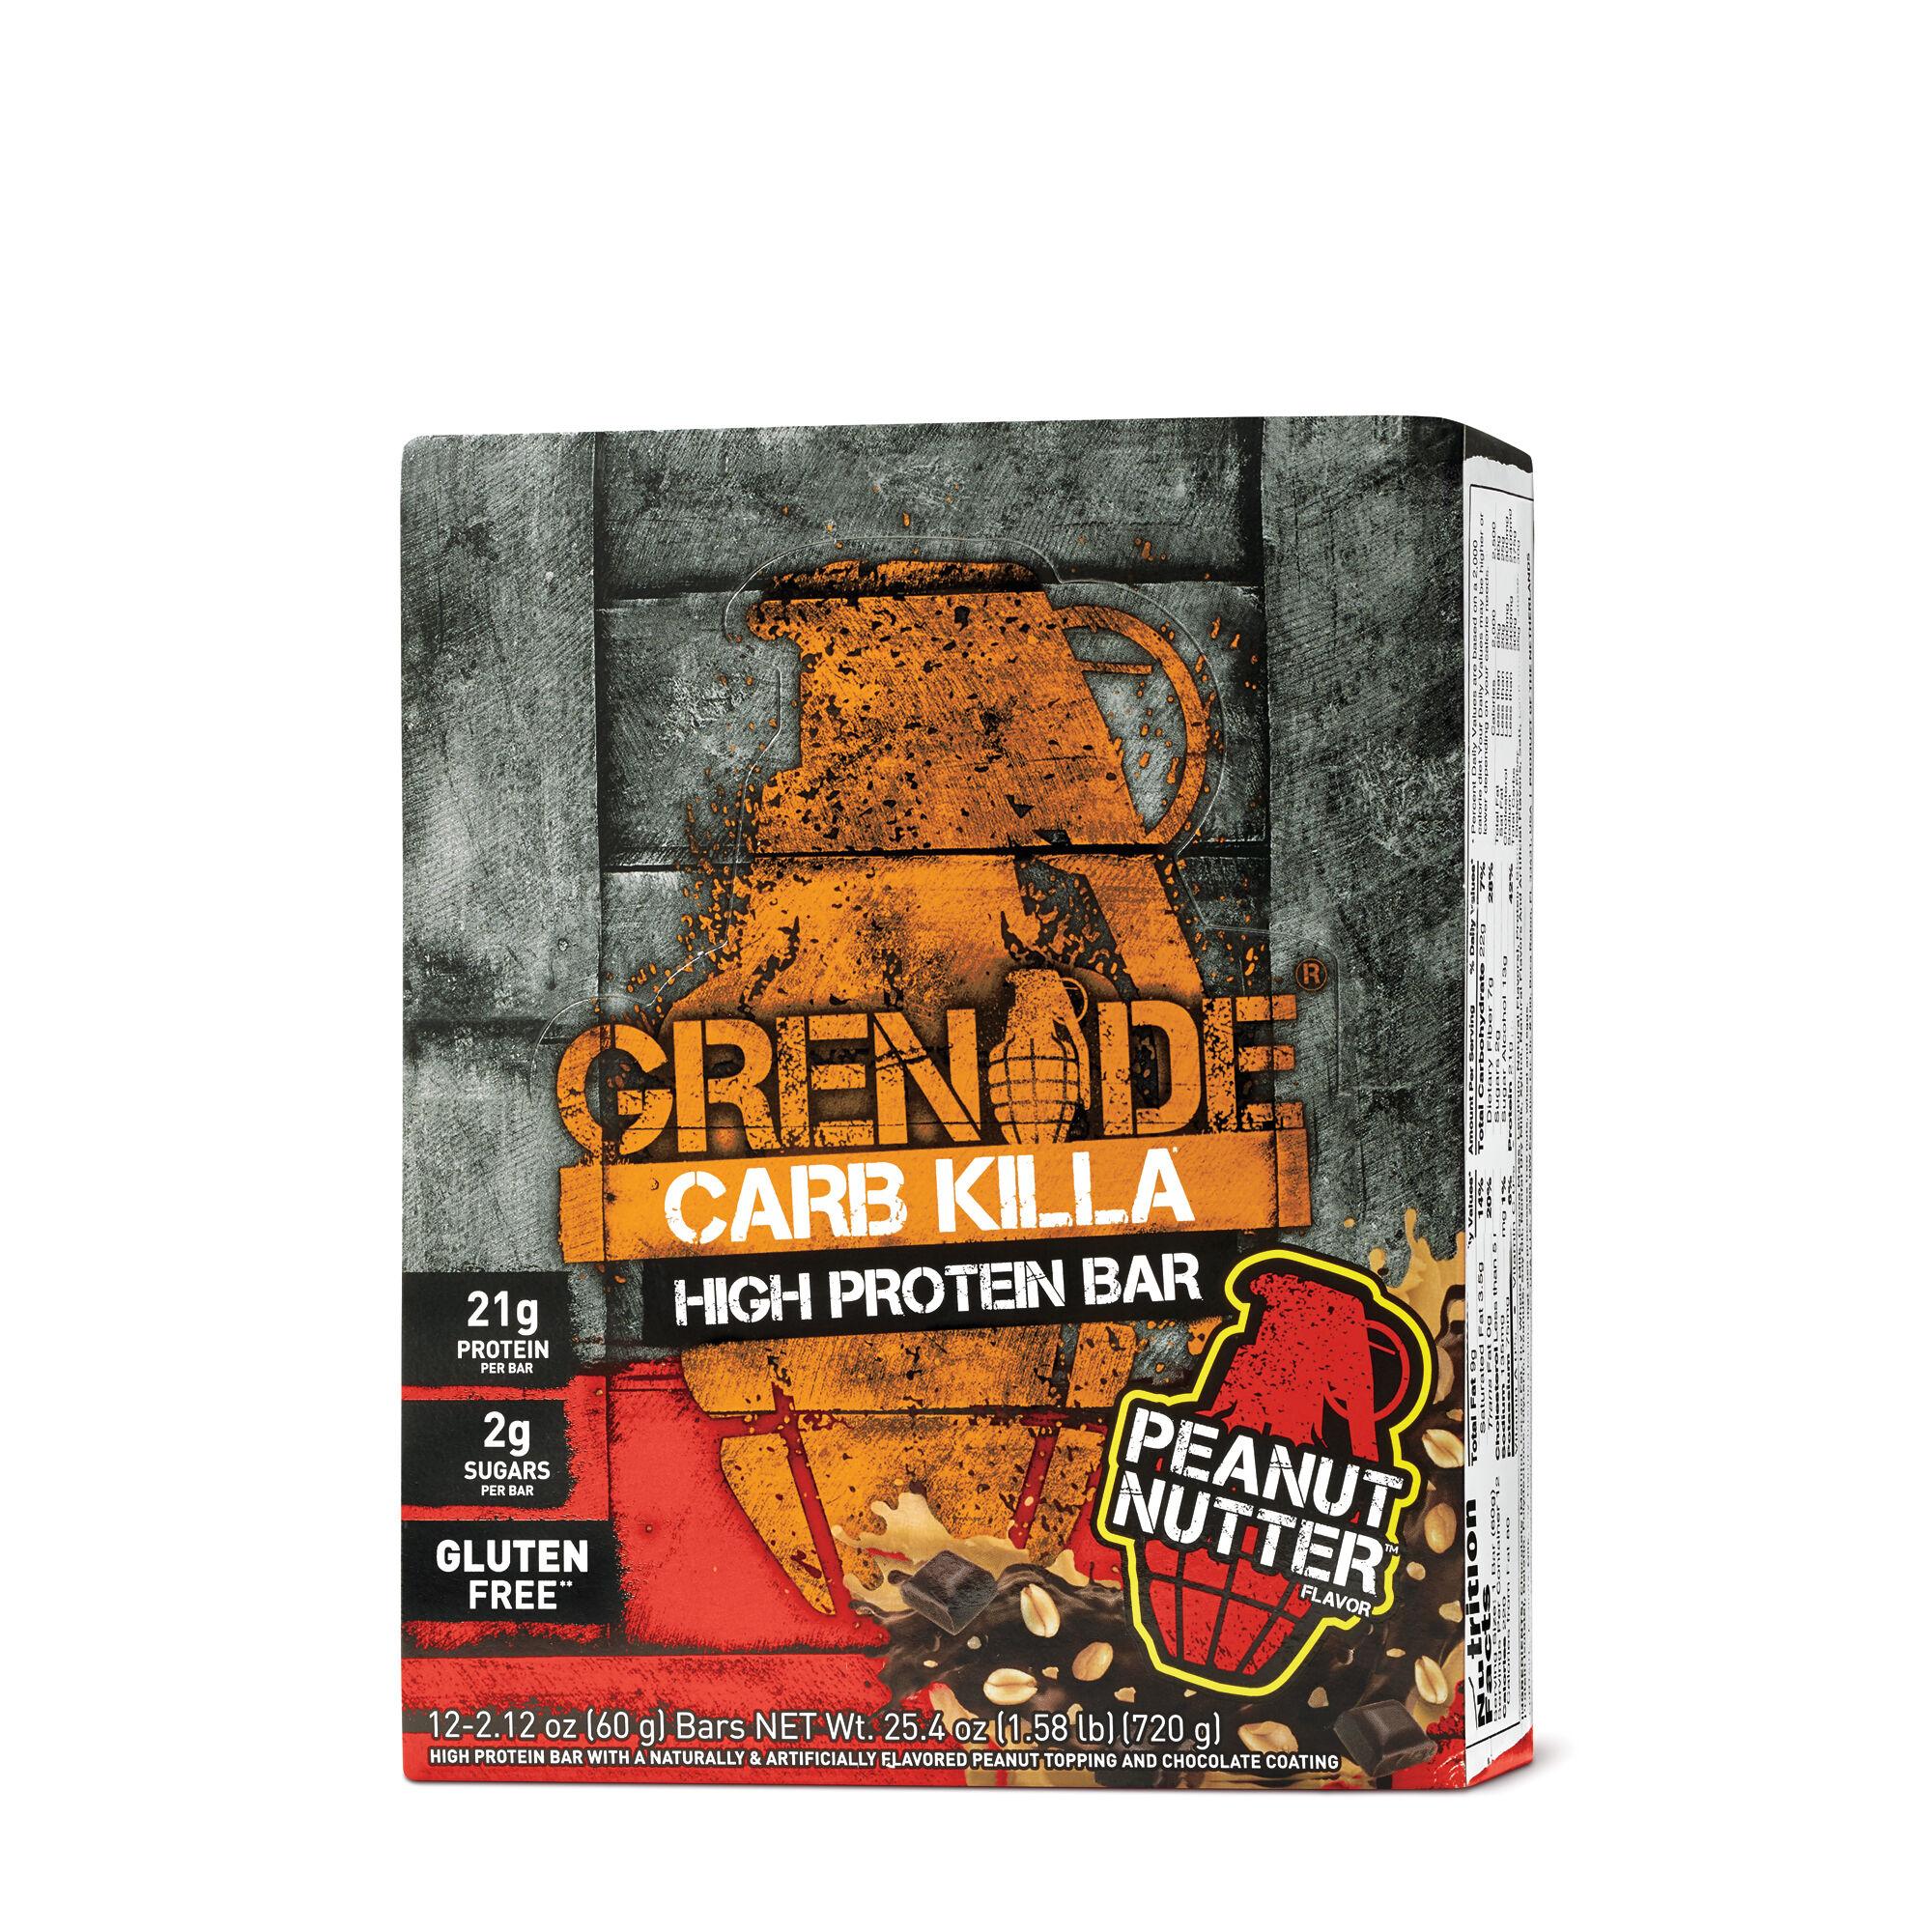 Carb Killa Peanut Butter GrenadePre & Post Workout Bars